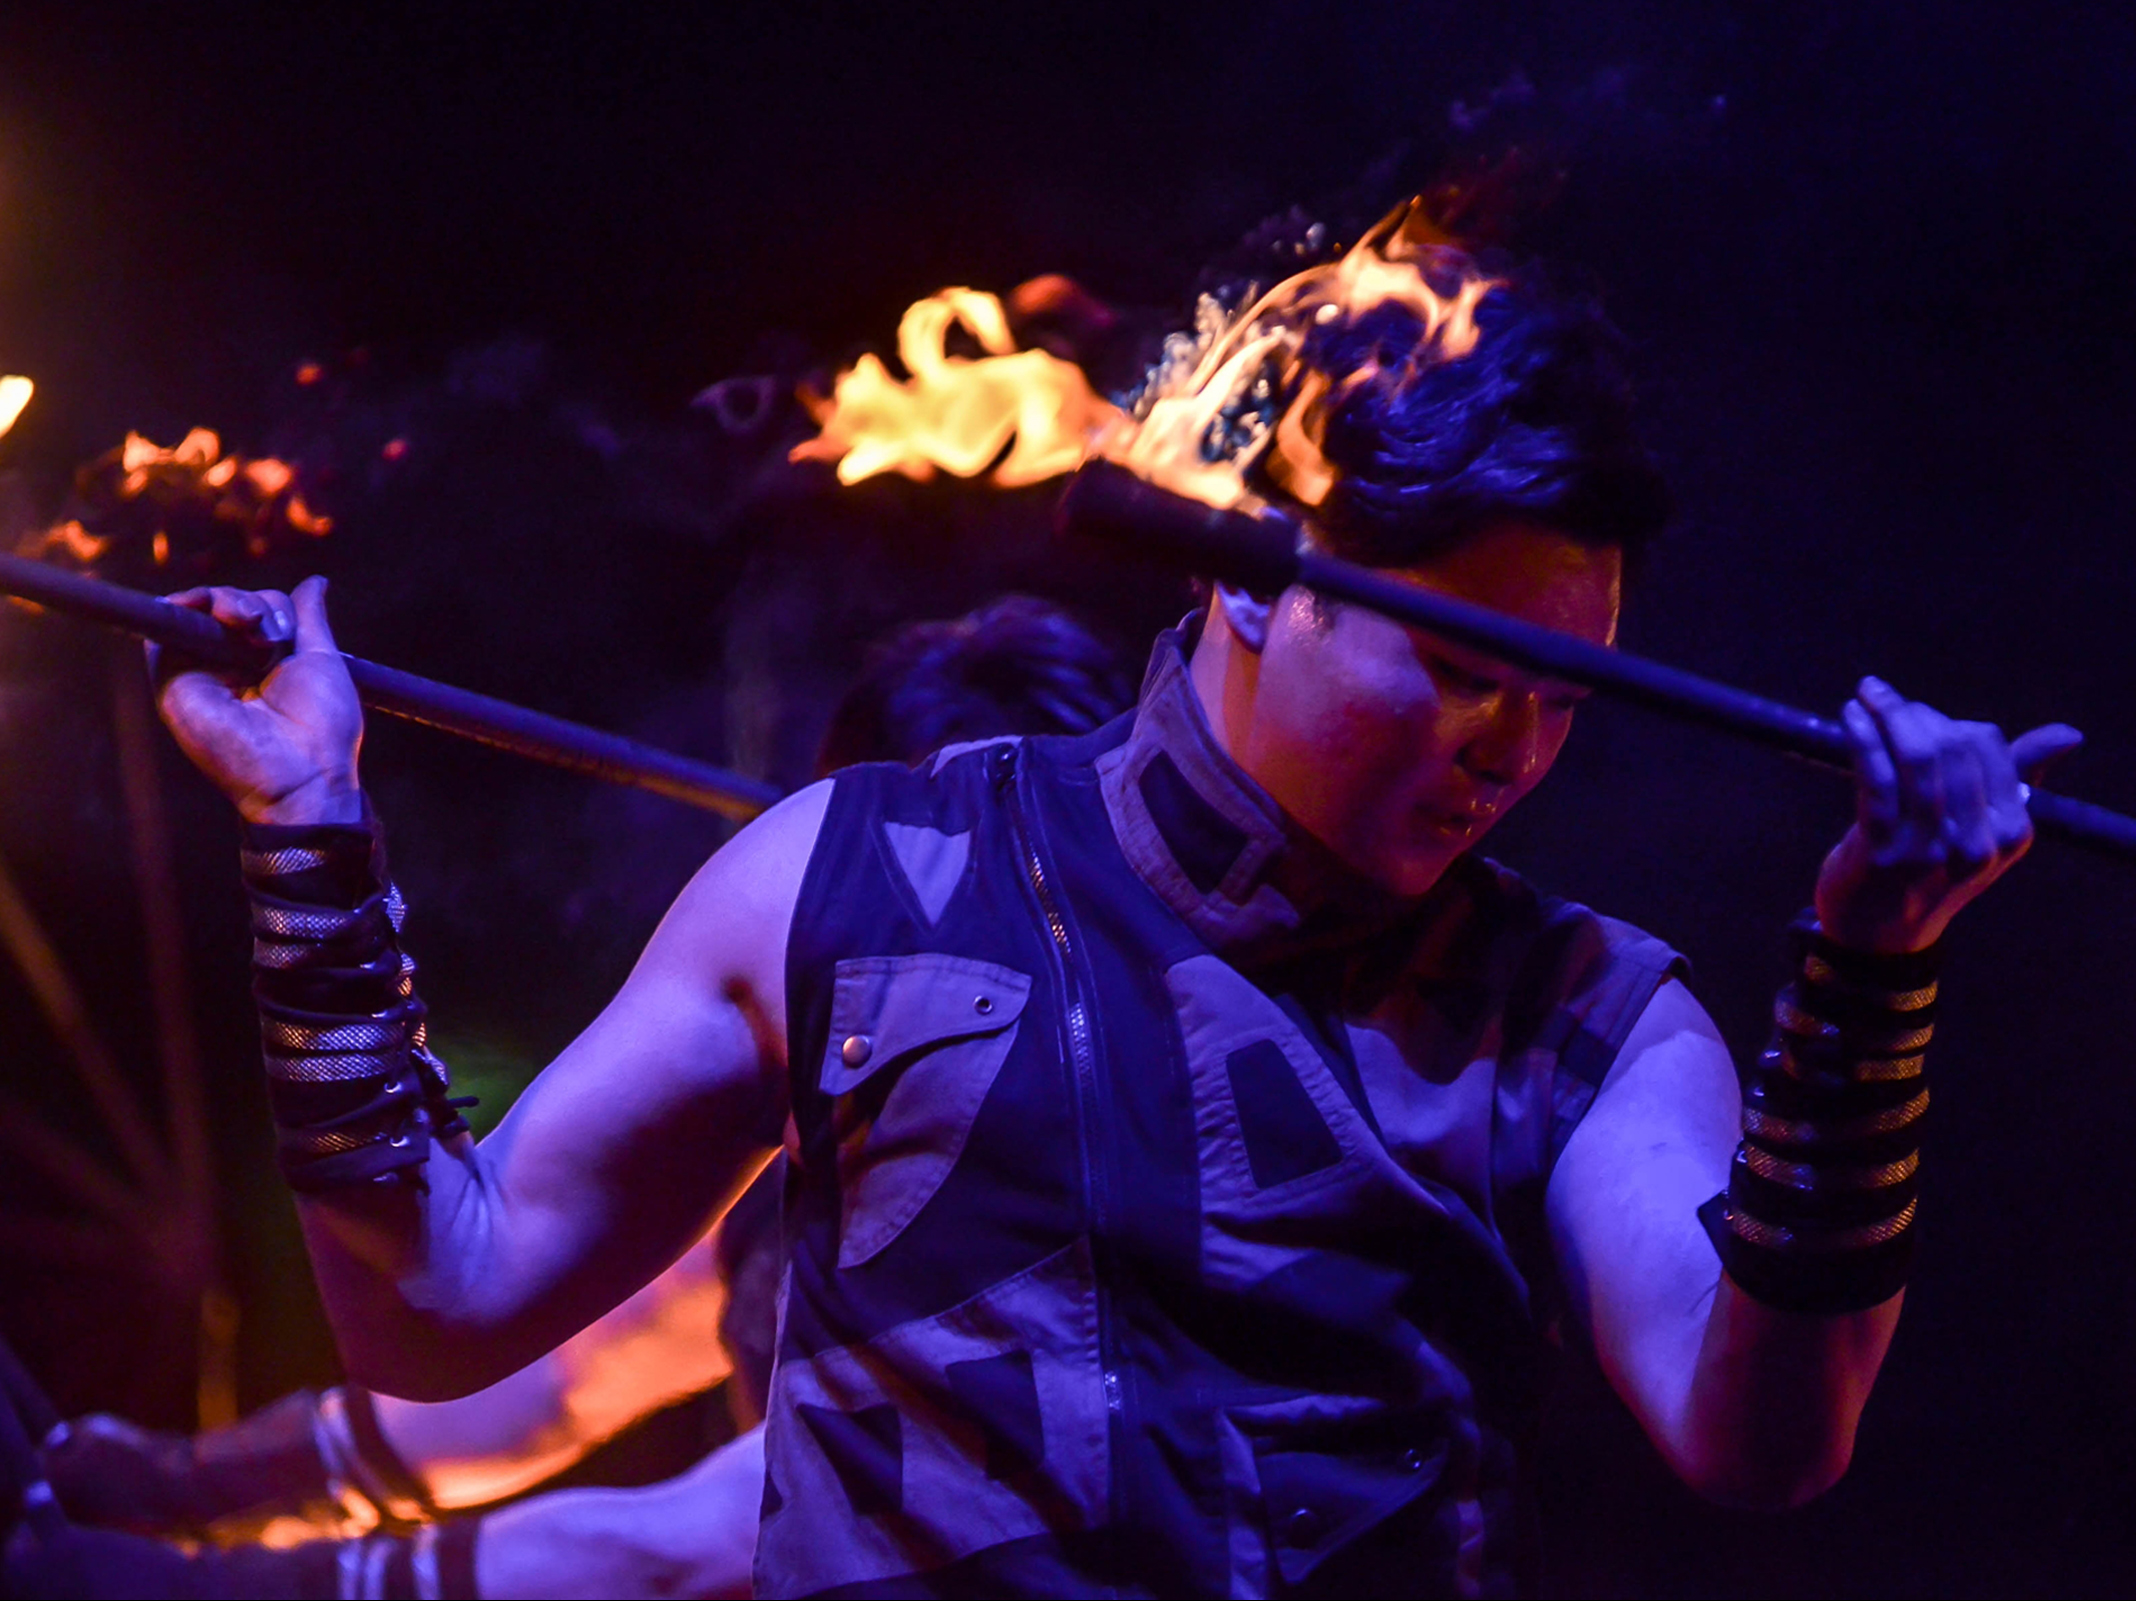 Fire Arts_Flaming Fire team_hunyflow (1)_1